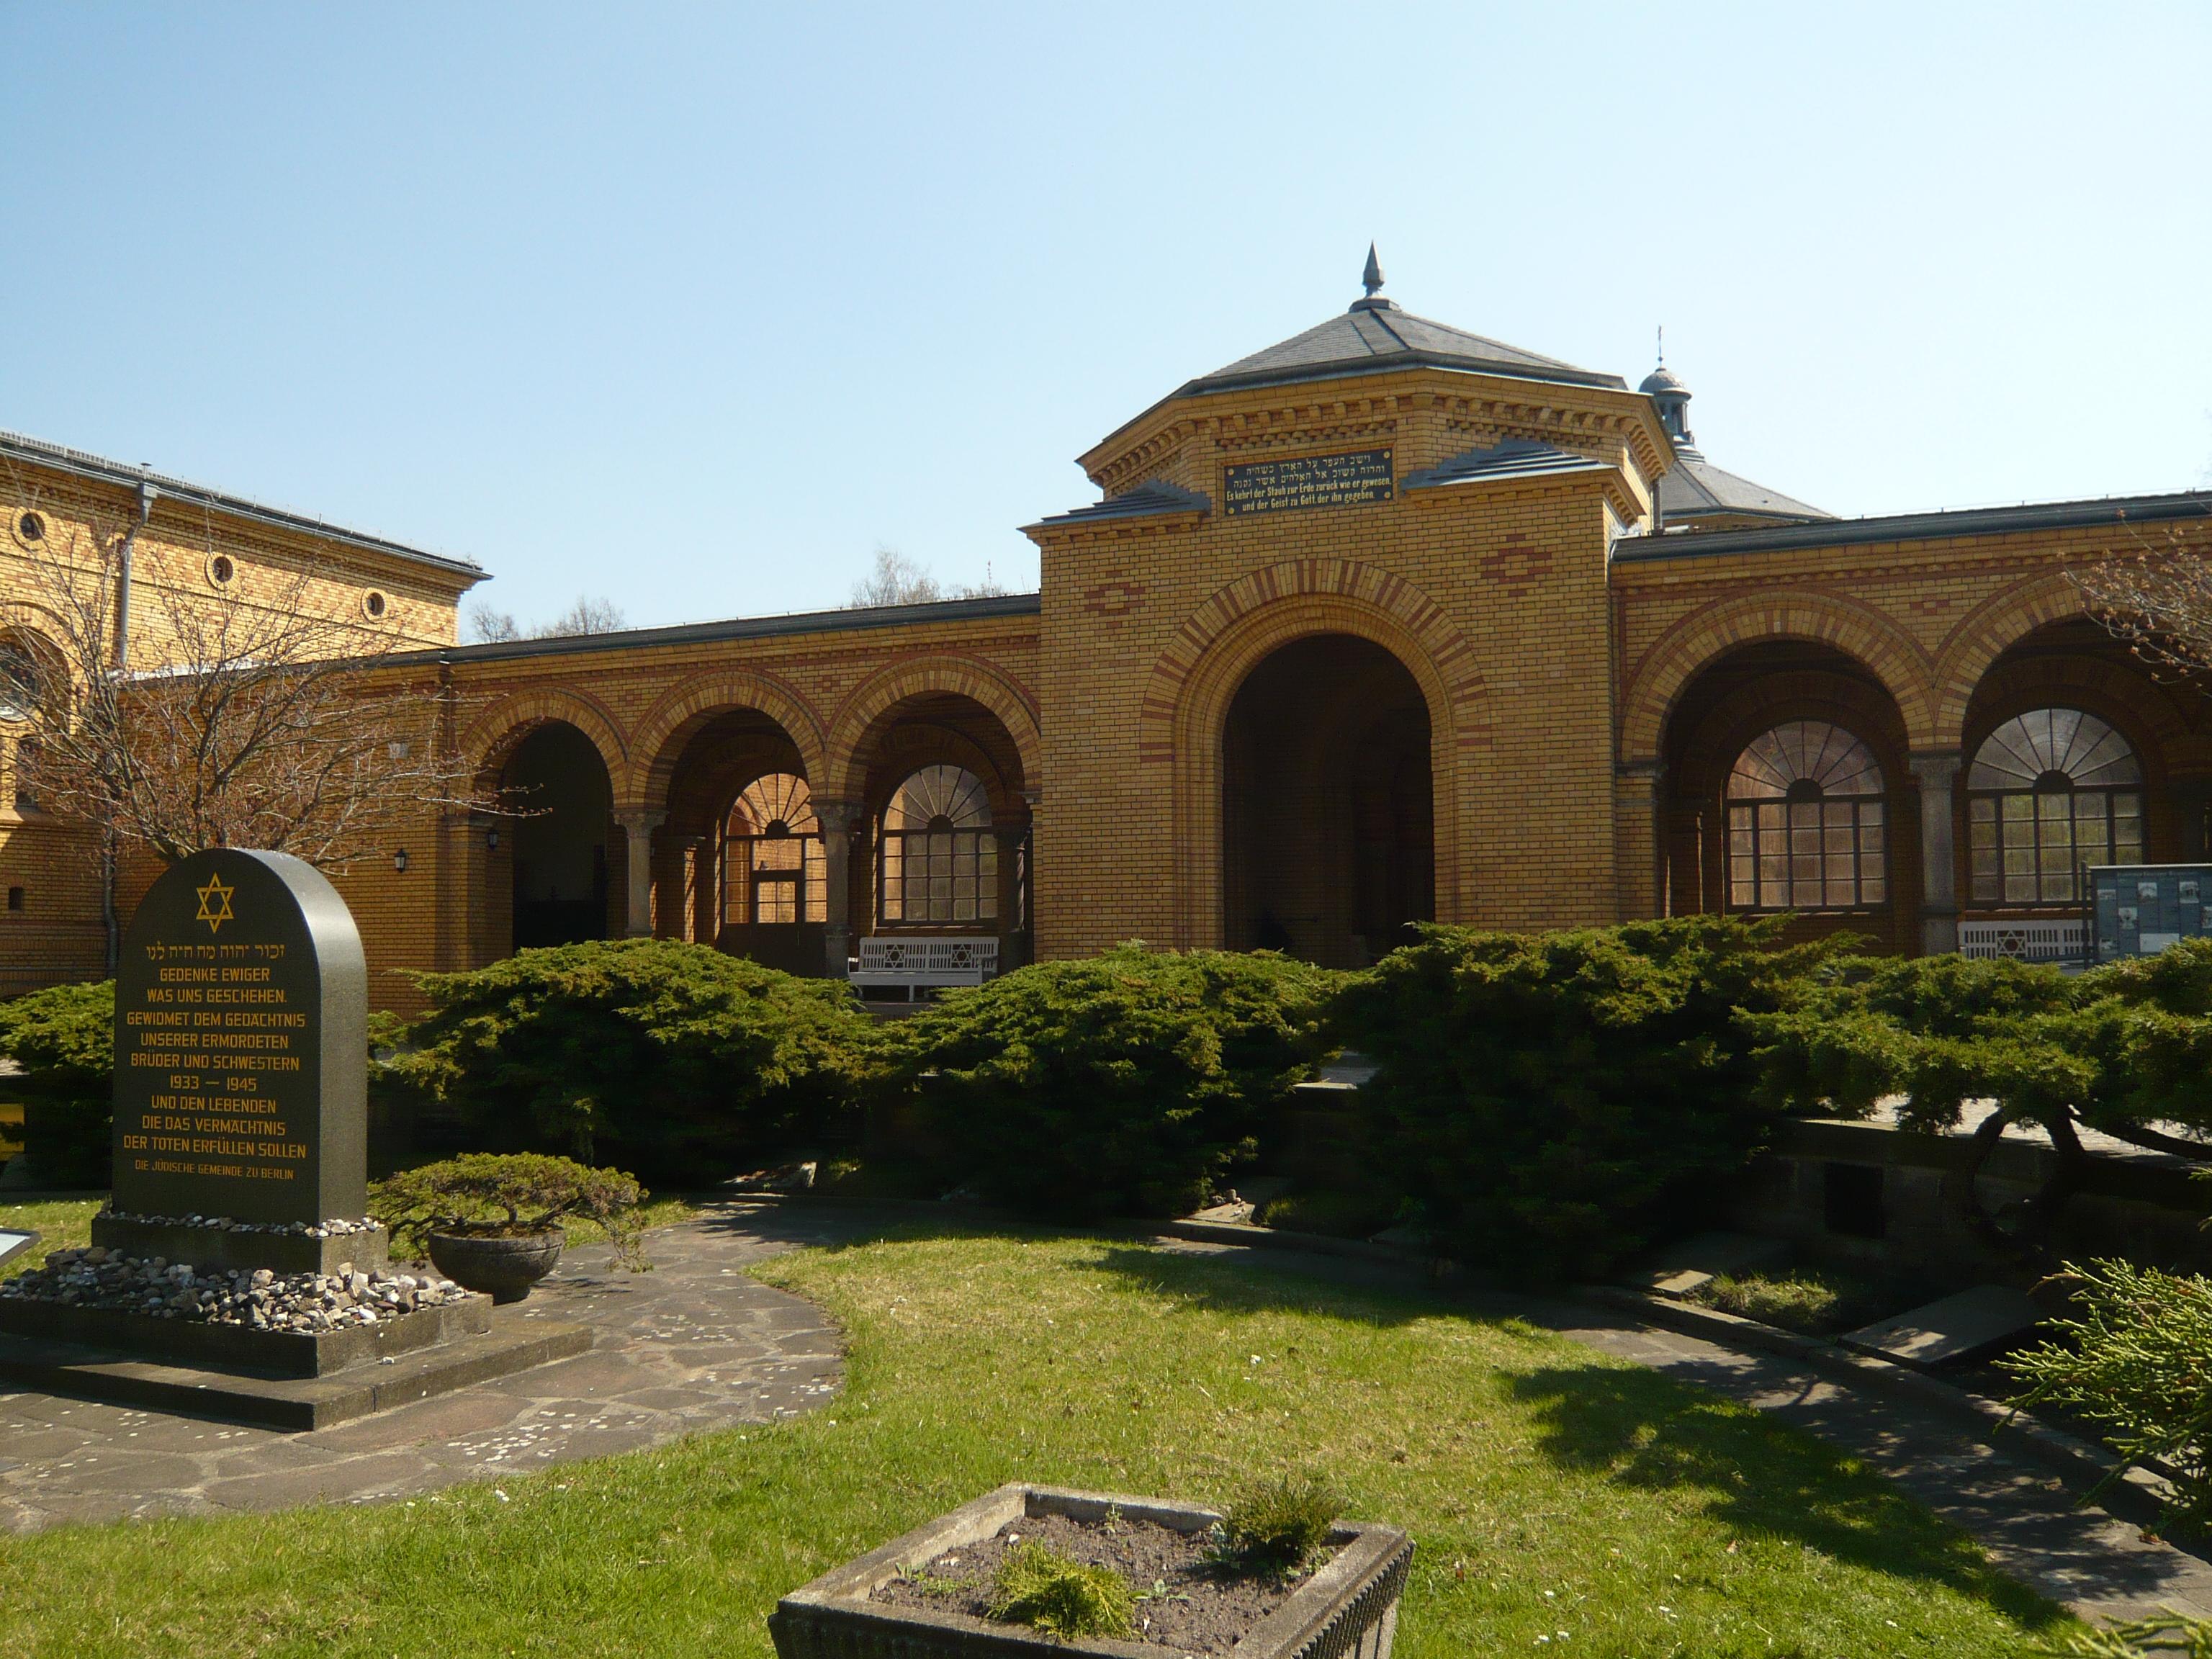 File:2010-04-18 673 Jüdischer Friedhof - fec AMA.B.JPG